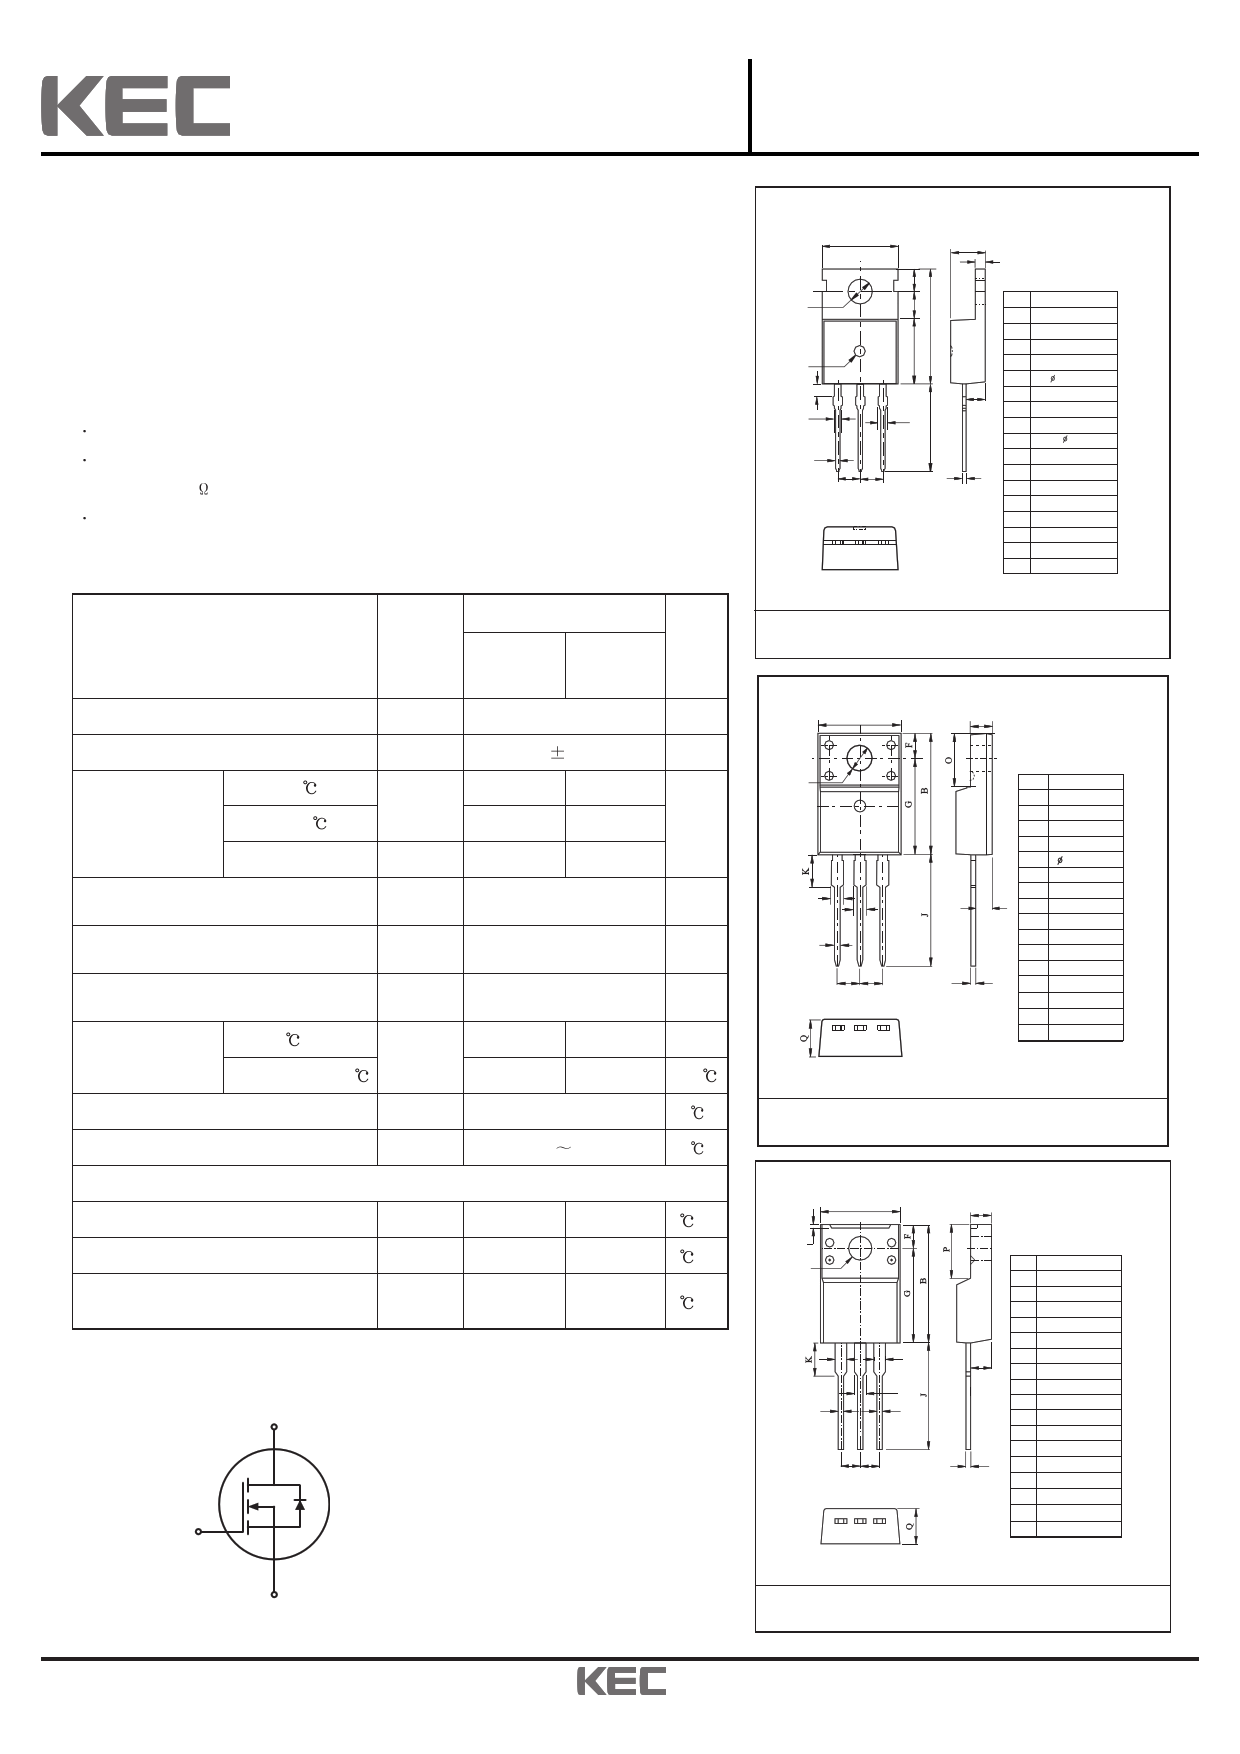 011N40P1 datasheet